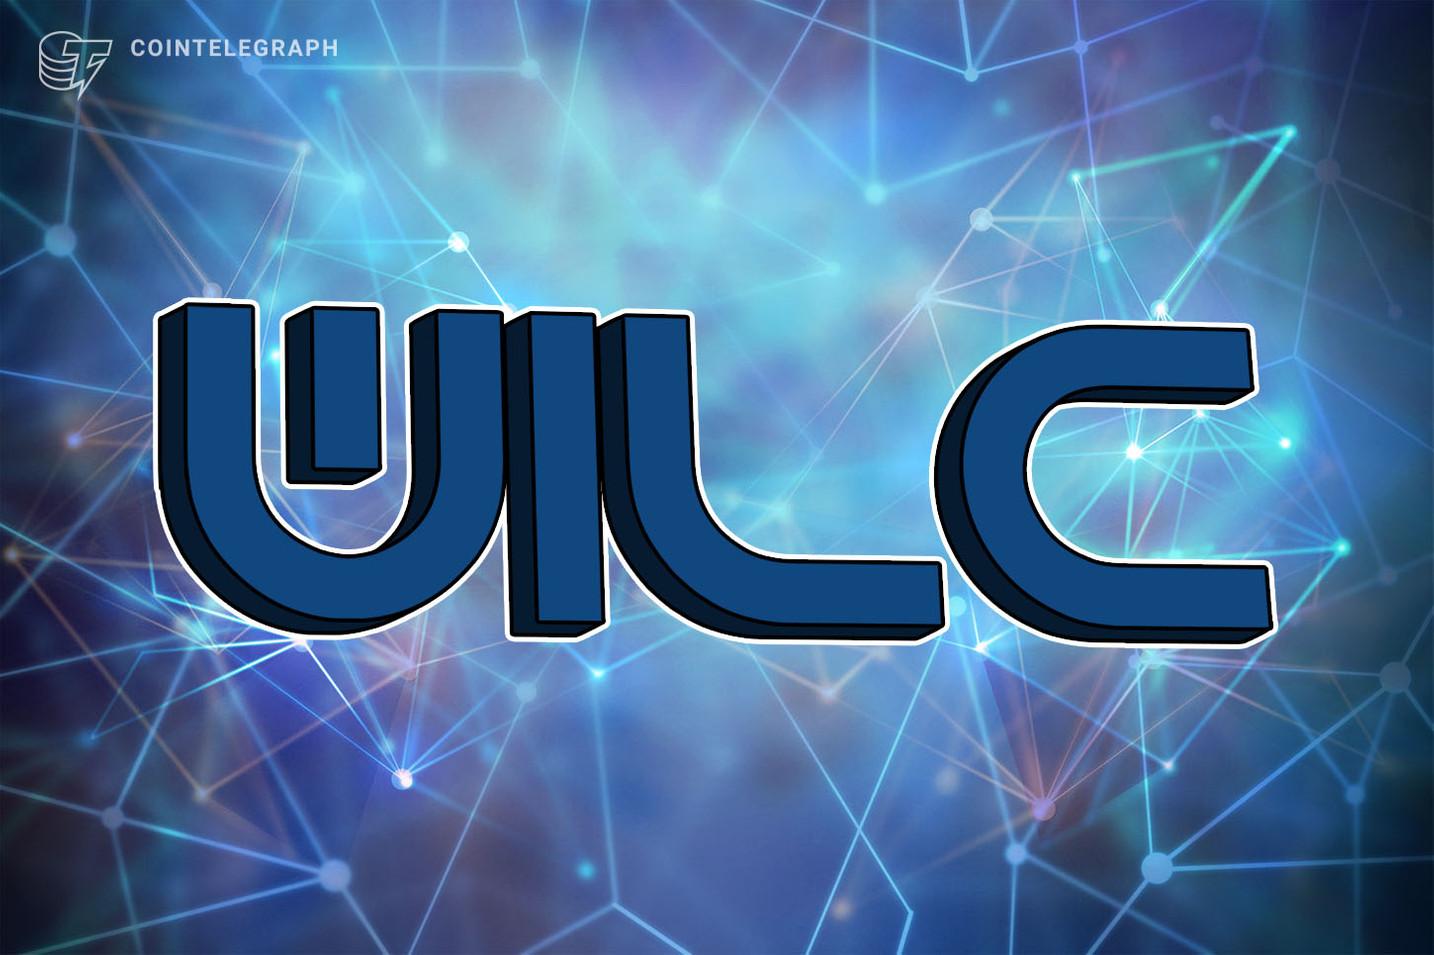 ILCoin项目在Uniswap DEX上发布Wrapped ILCoin代币